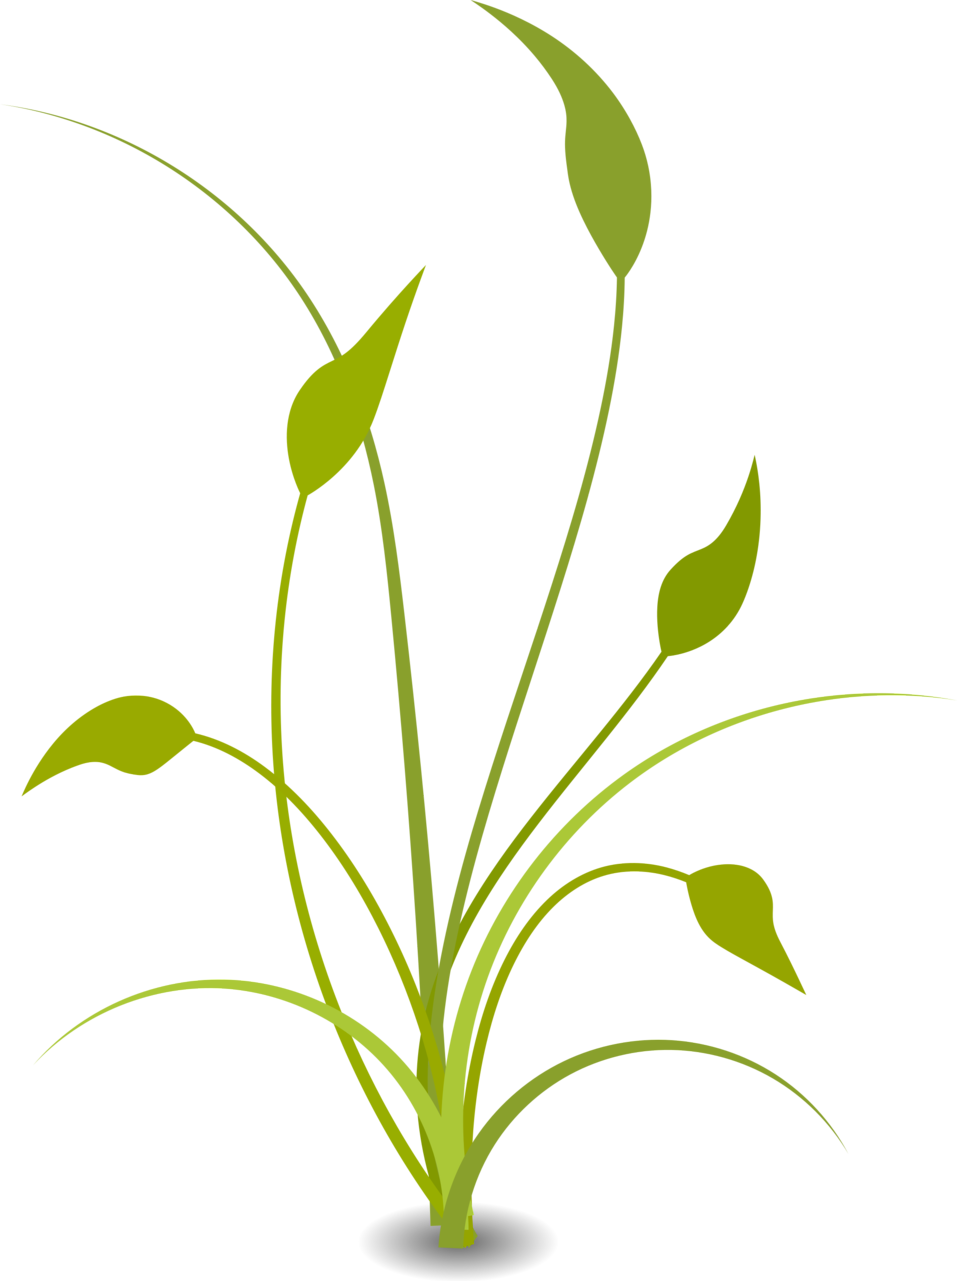 Free Plant Transparent Background, Download Free Clip Art.